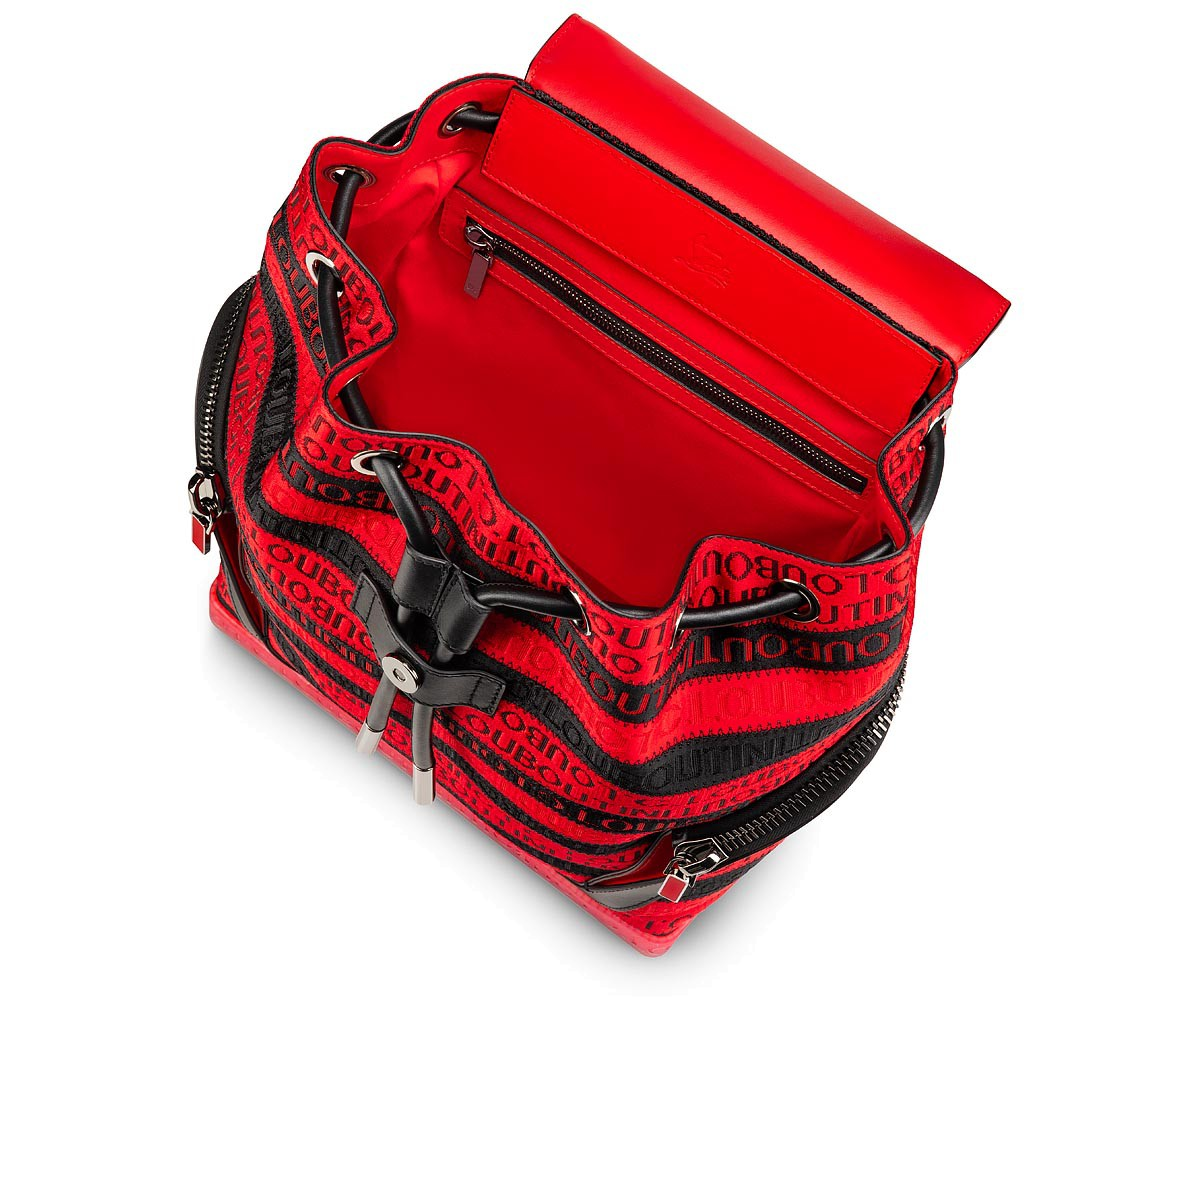 Bags - Explorafunk  Cl Strap - Christian Louboutin